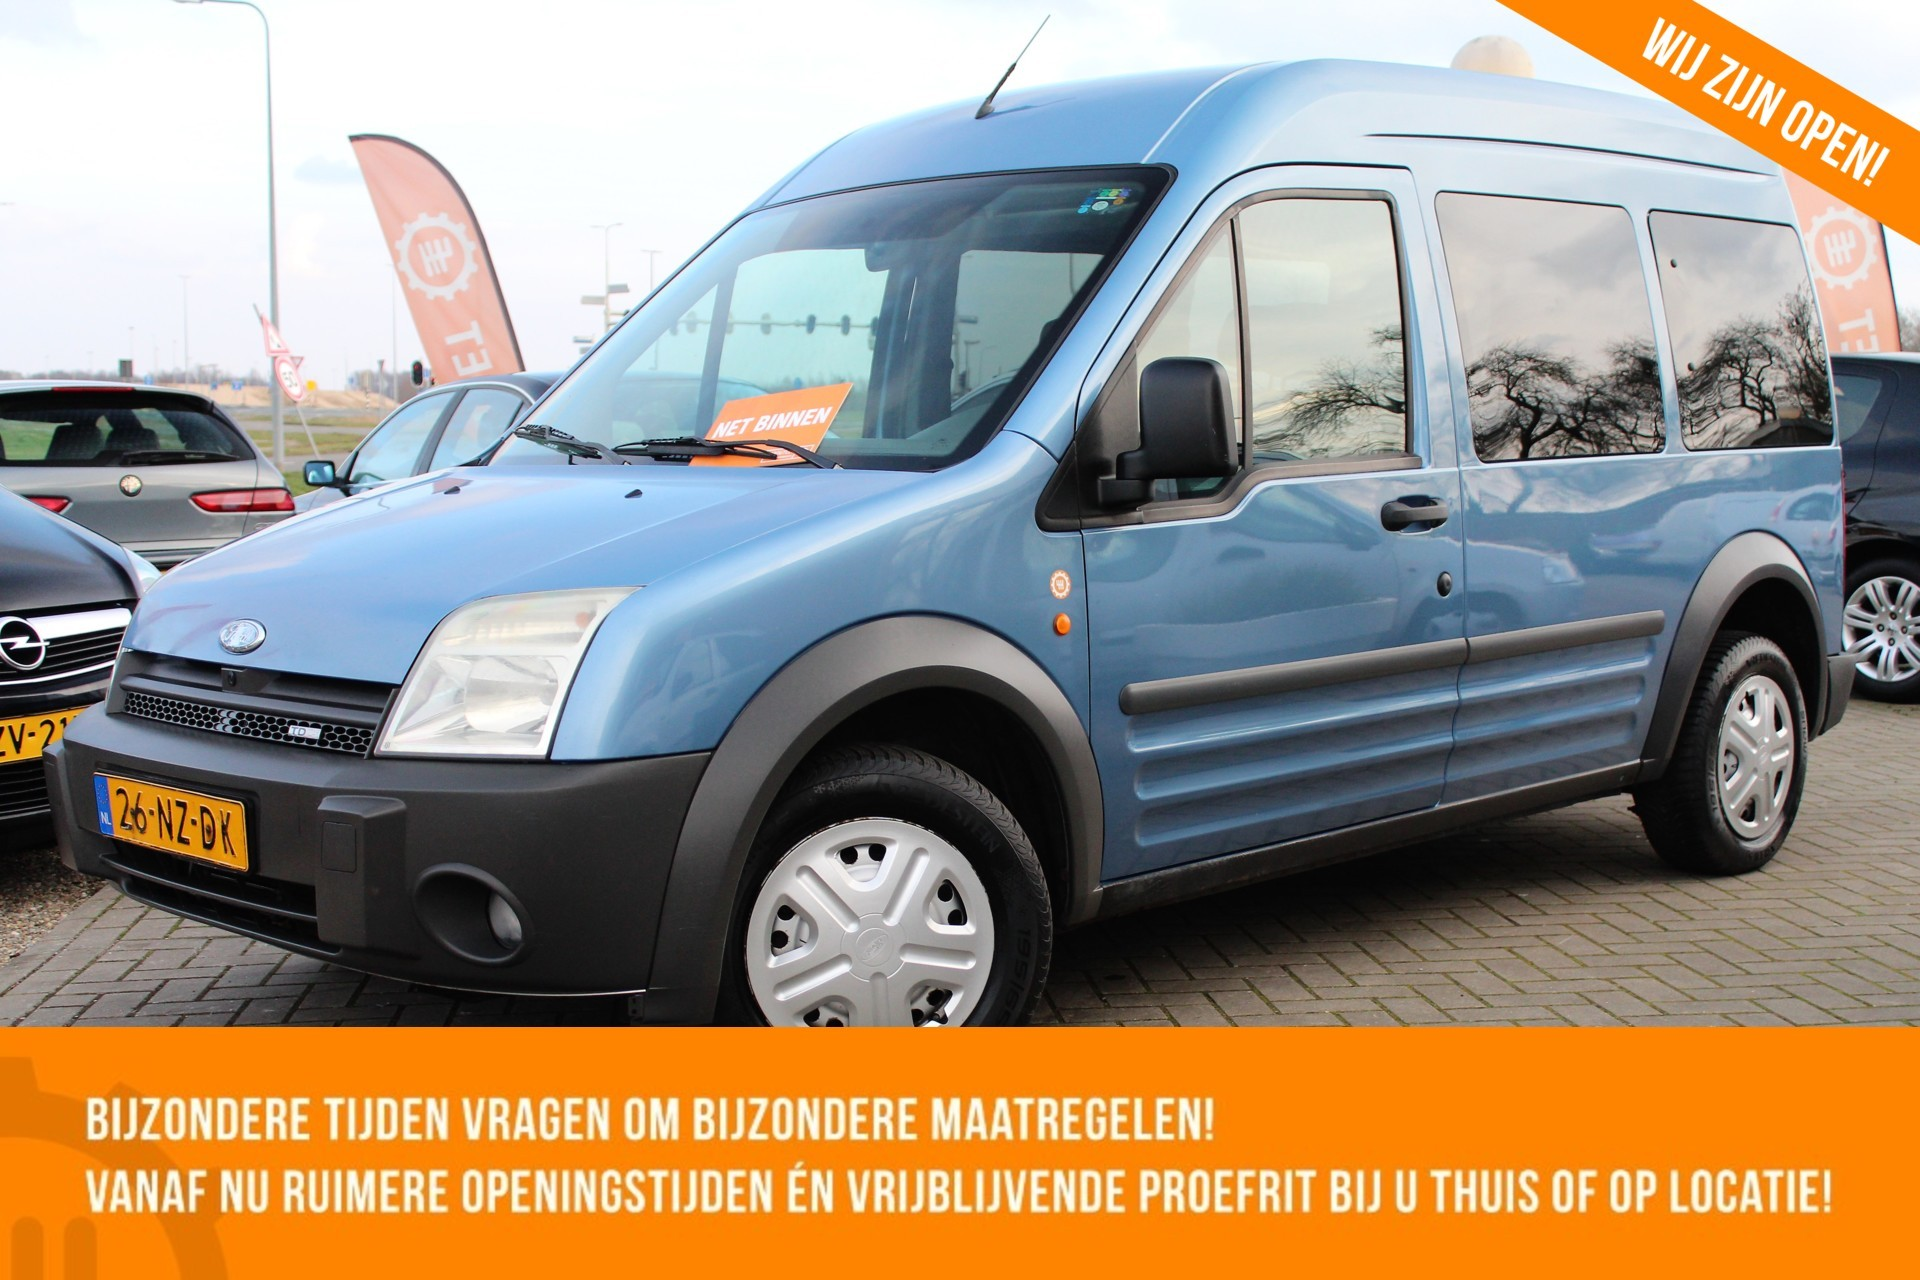 Caroutlet Groningen - Ford Tourneo Connect 1.8 TDCi LWB | AIRCO | ZIJSCHUIFDEUR  |